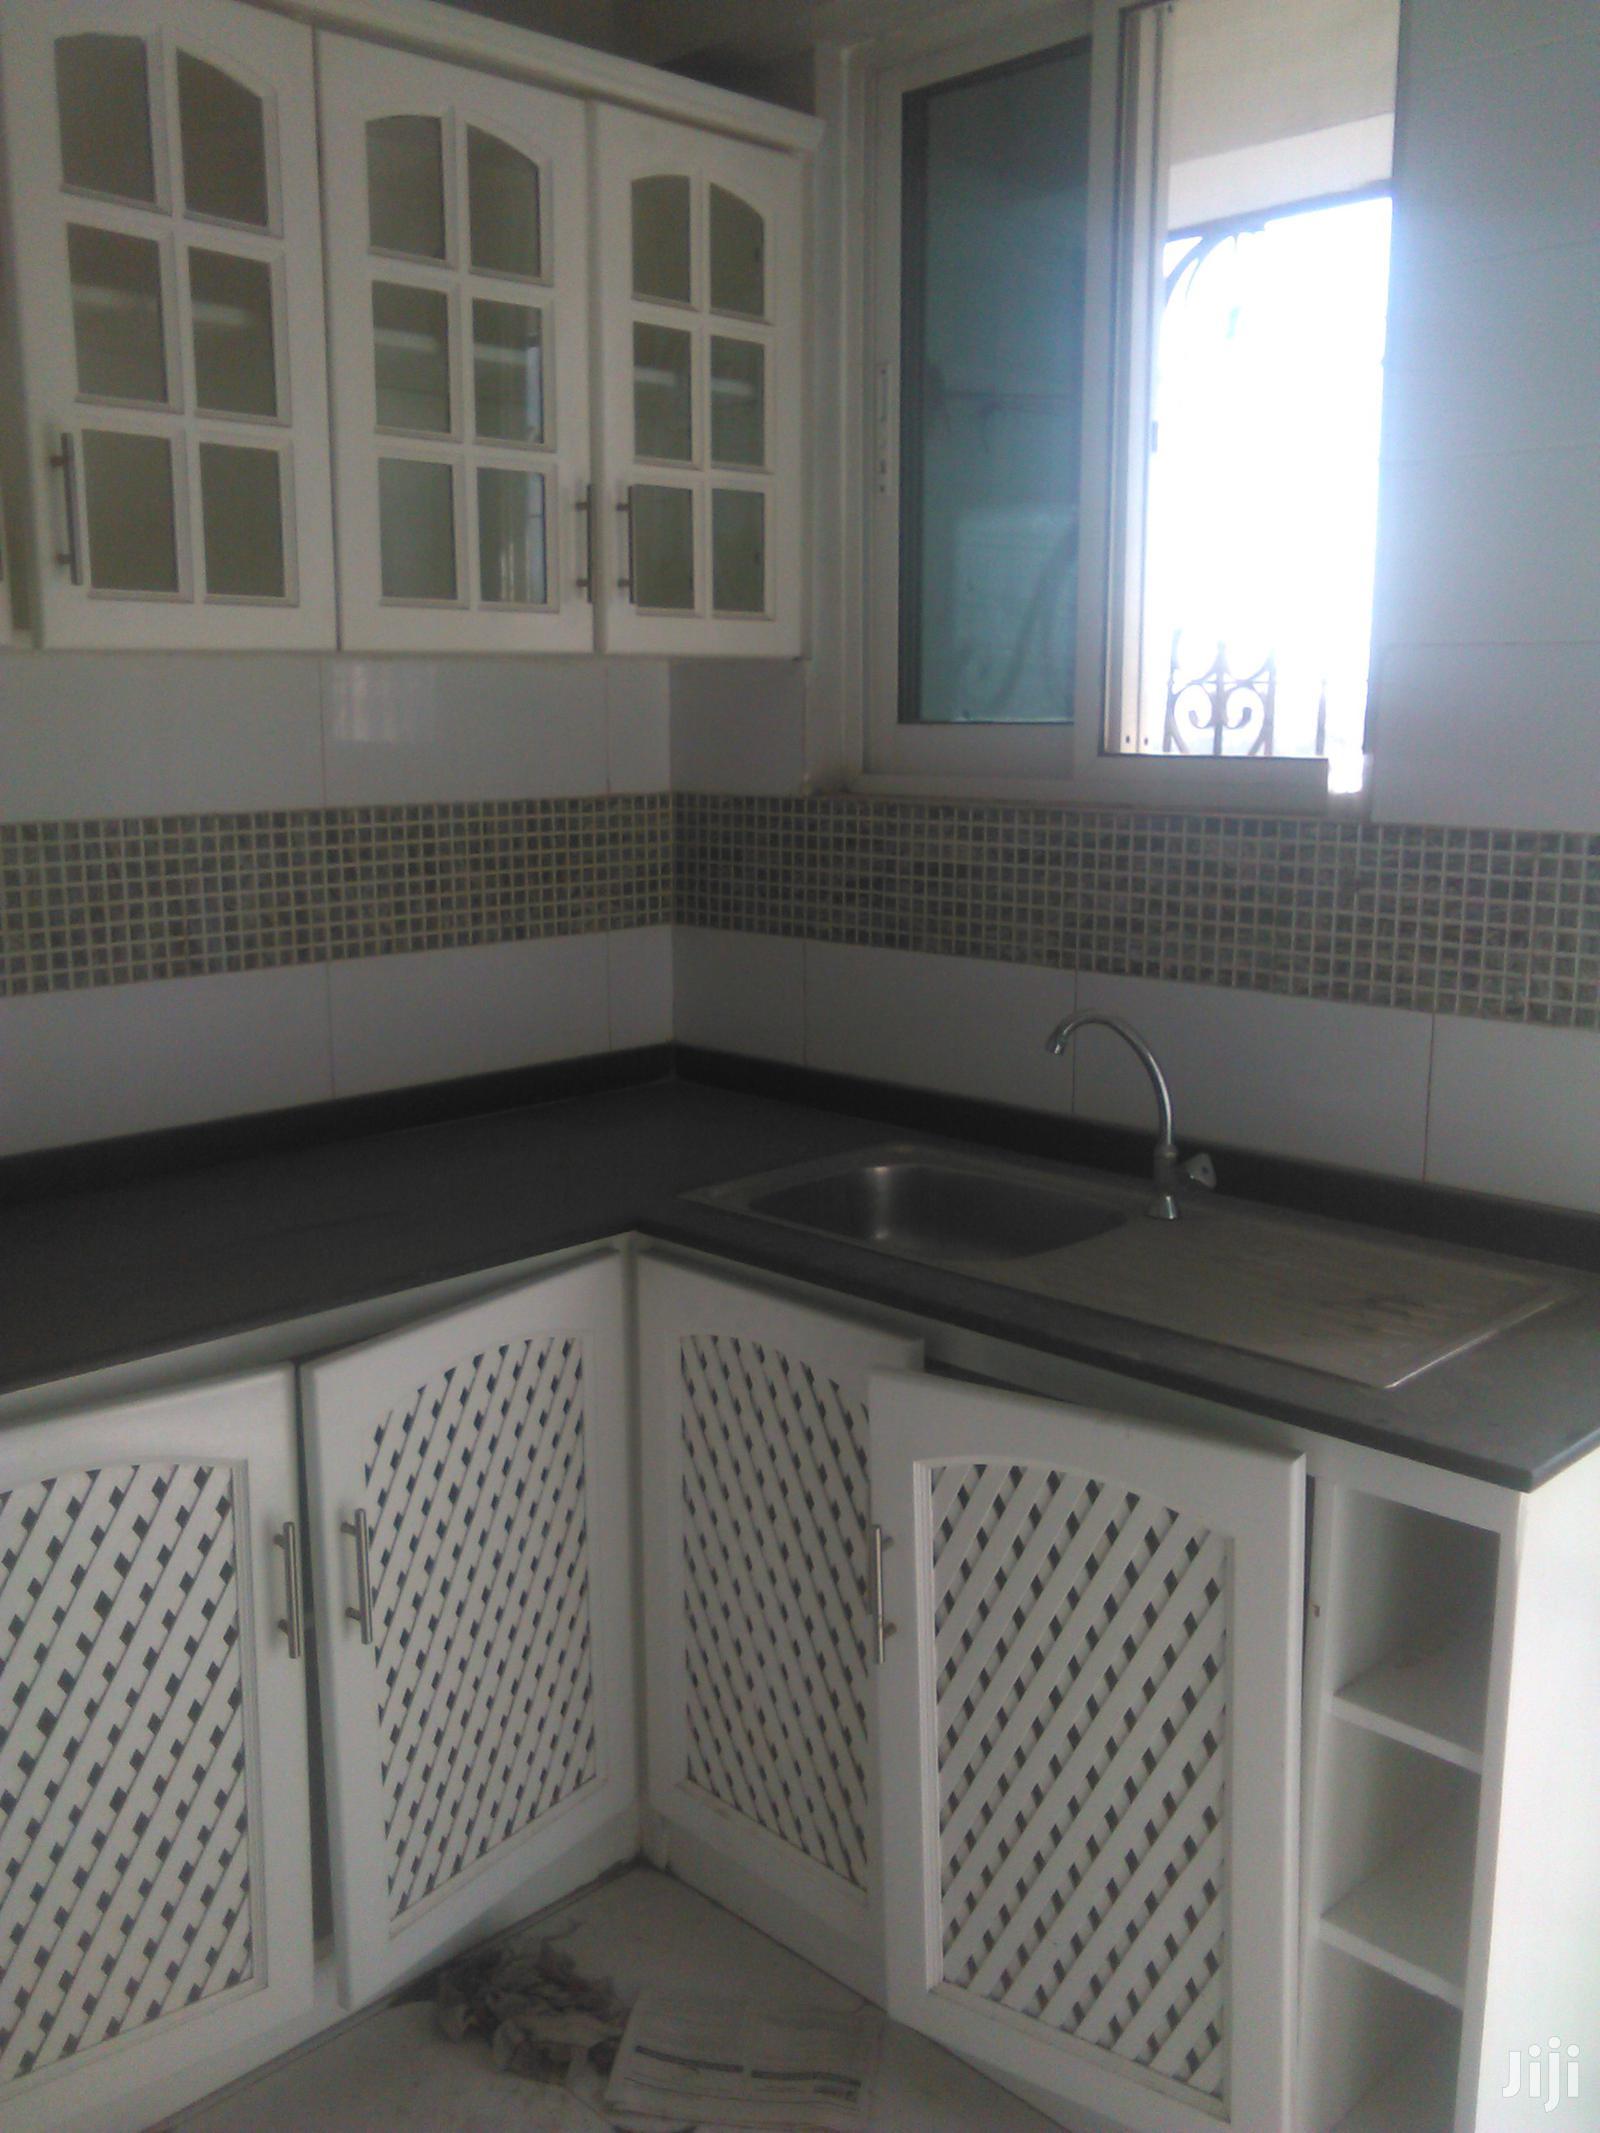 Ina Master Na Vyumba2, Sebule,Jiko,Public Toilet Na Parking | Houses & Apartments For Rent for sale in Kinondoni, Dar es Salaam, Tanzania